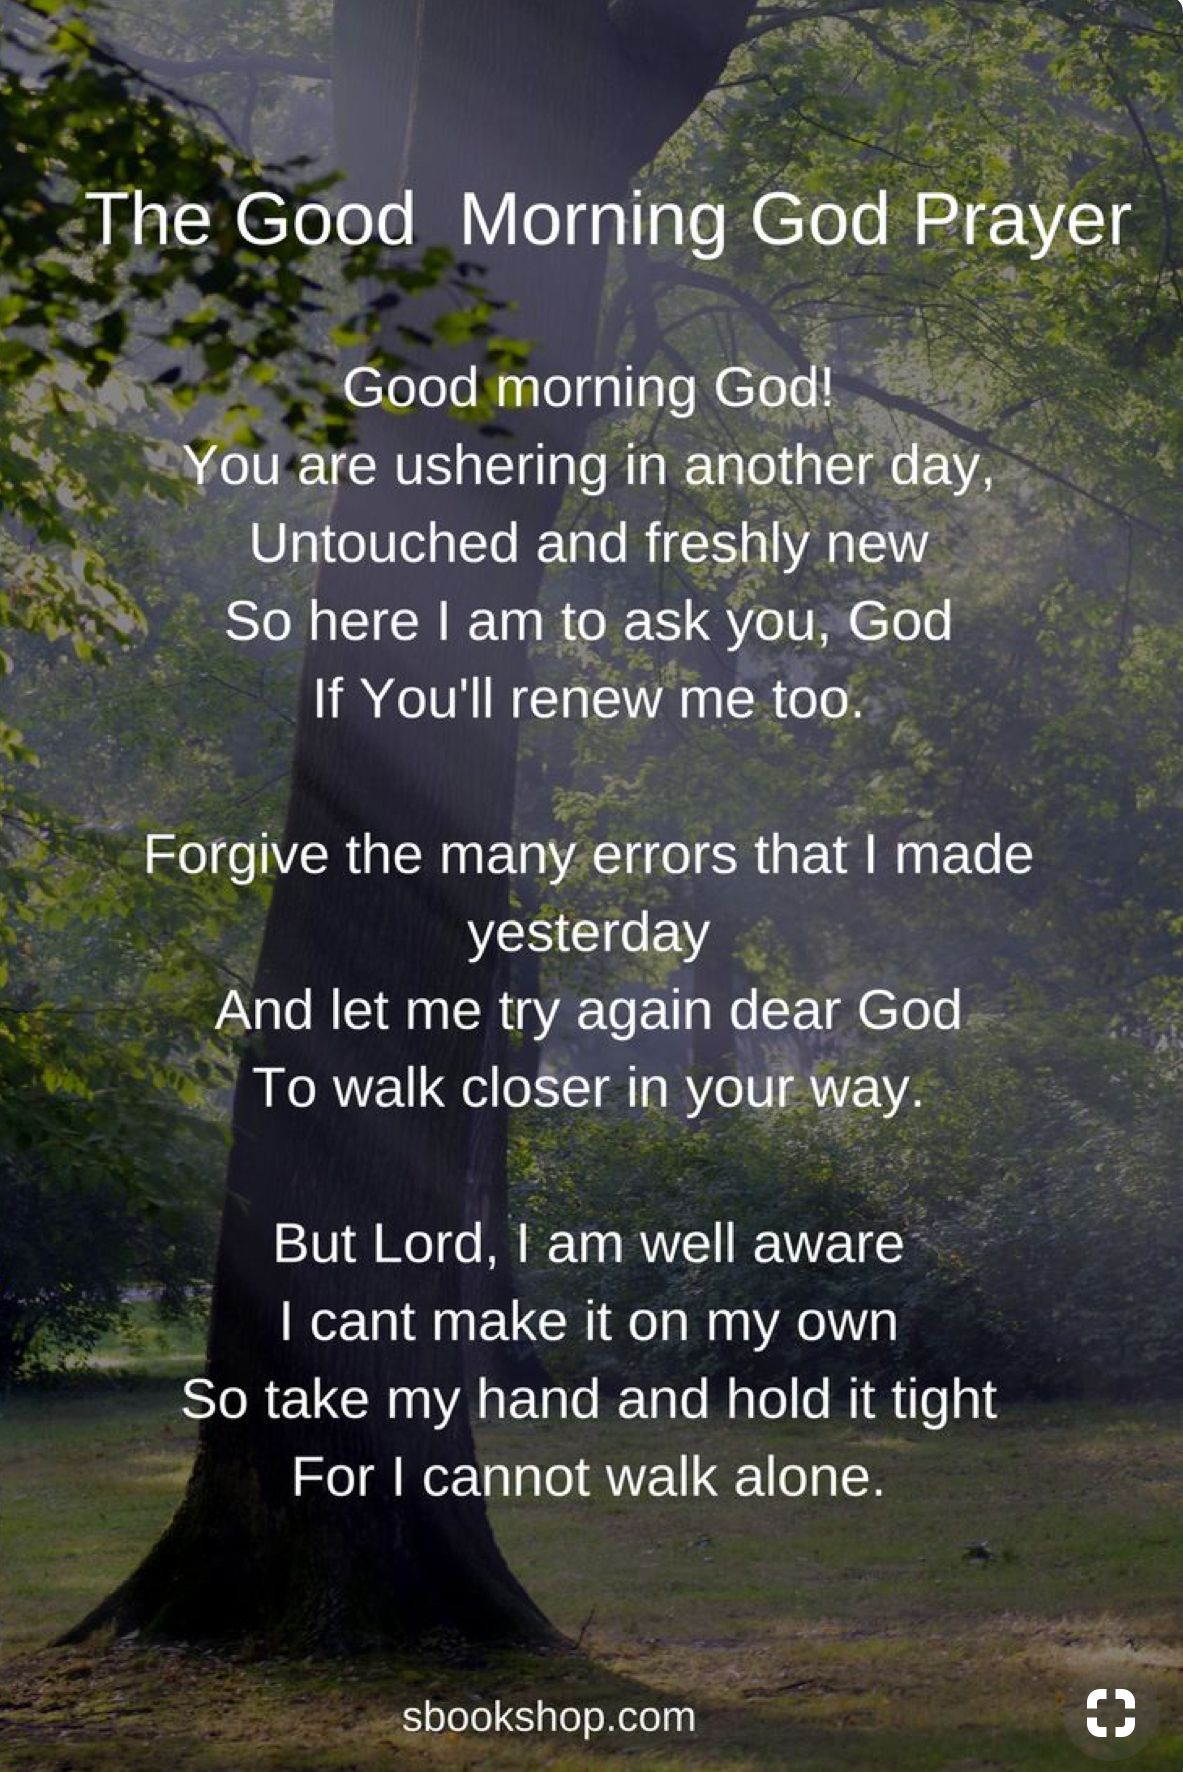 Good Morning Quotes Prayer : The good morning prayer quotes prayers pinterest